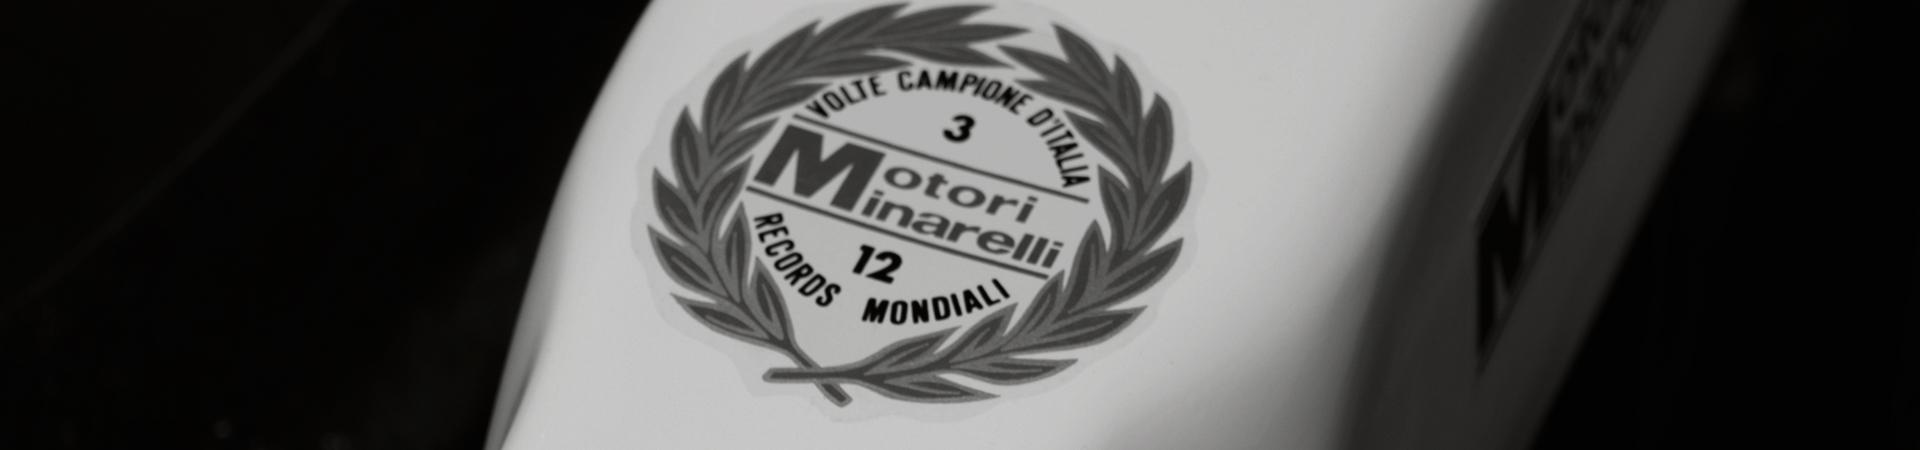 Minarelli